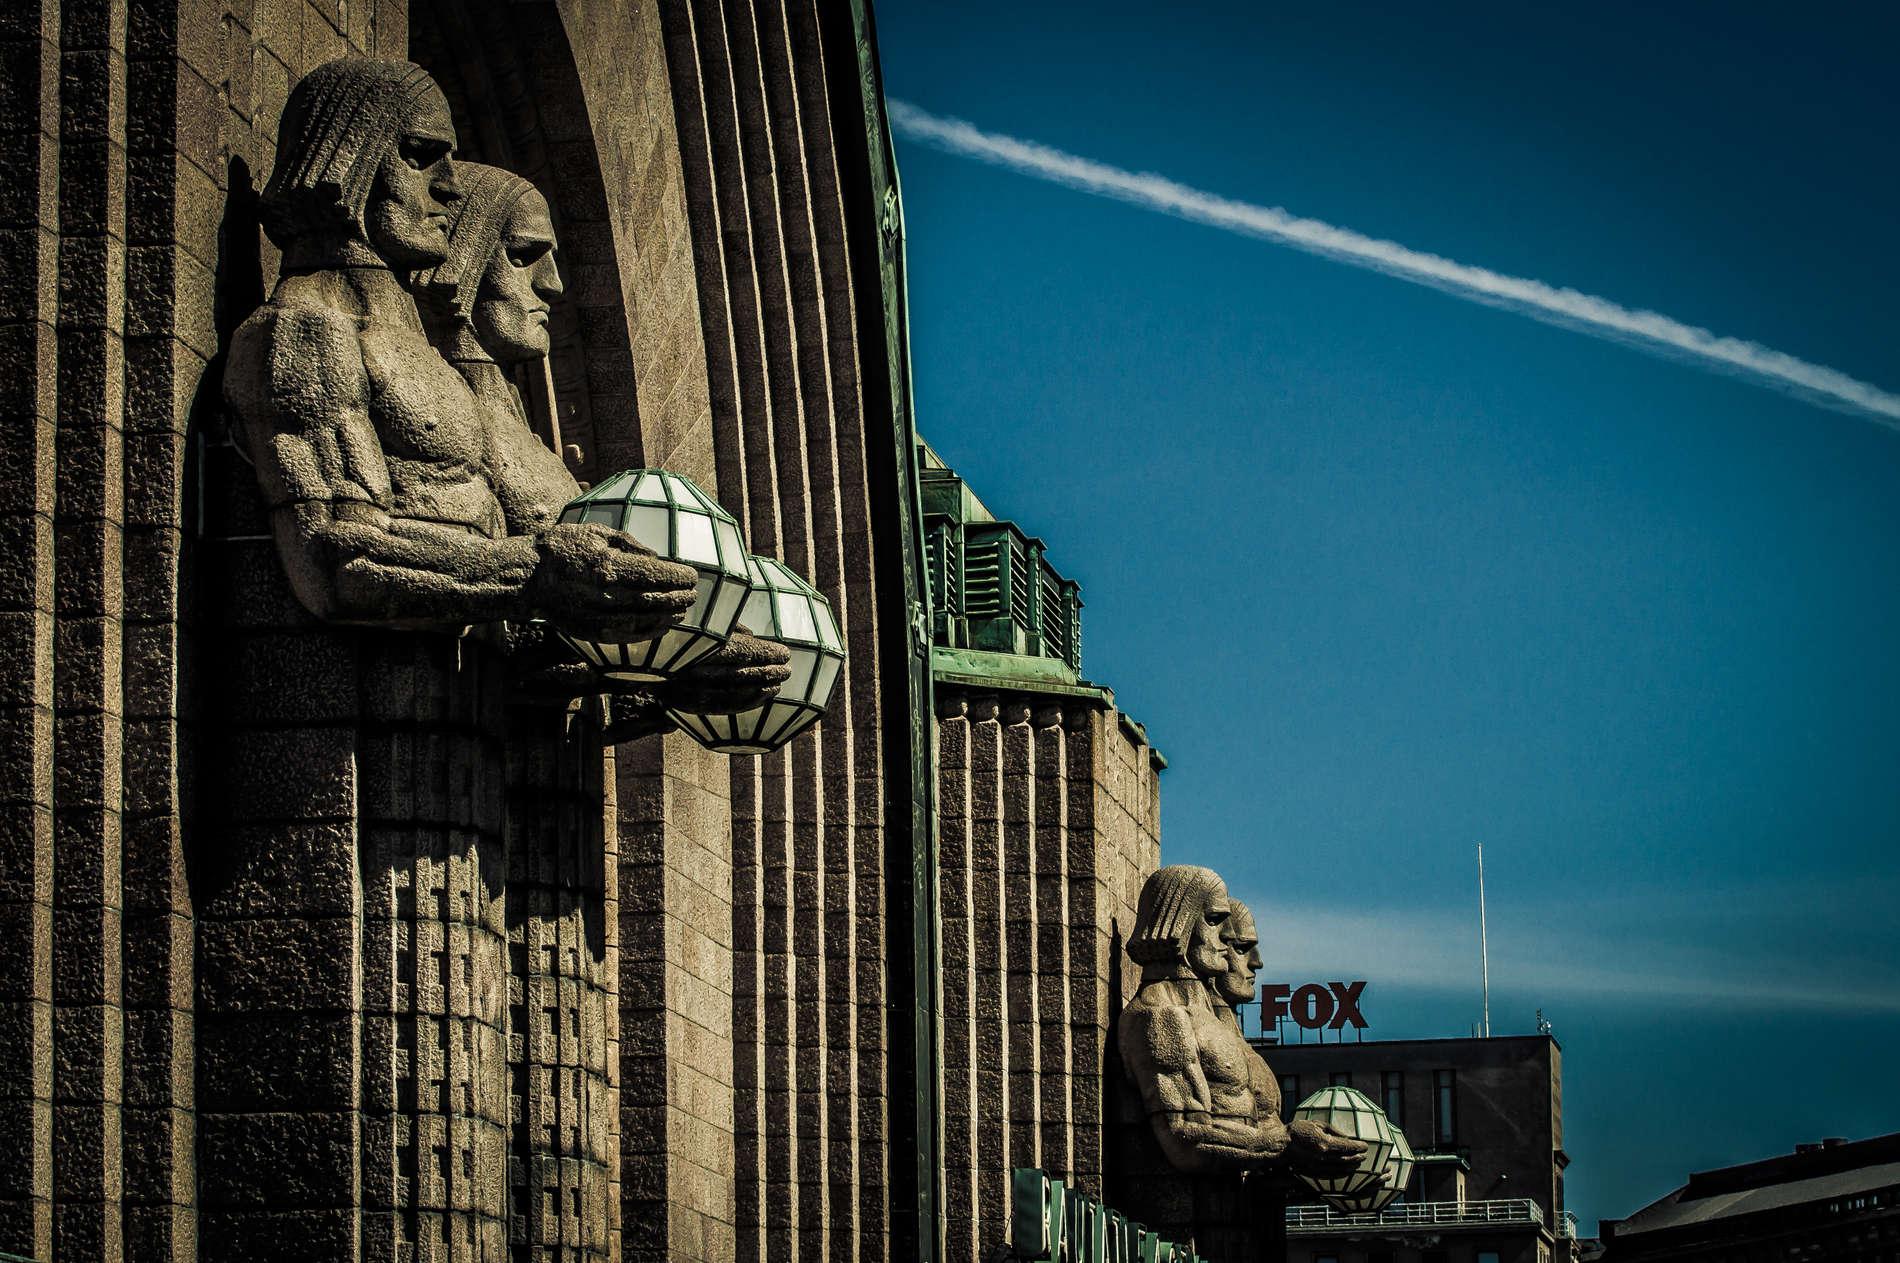 Фотография: Goetze Images - Helsinki Marketing